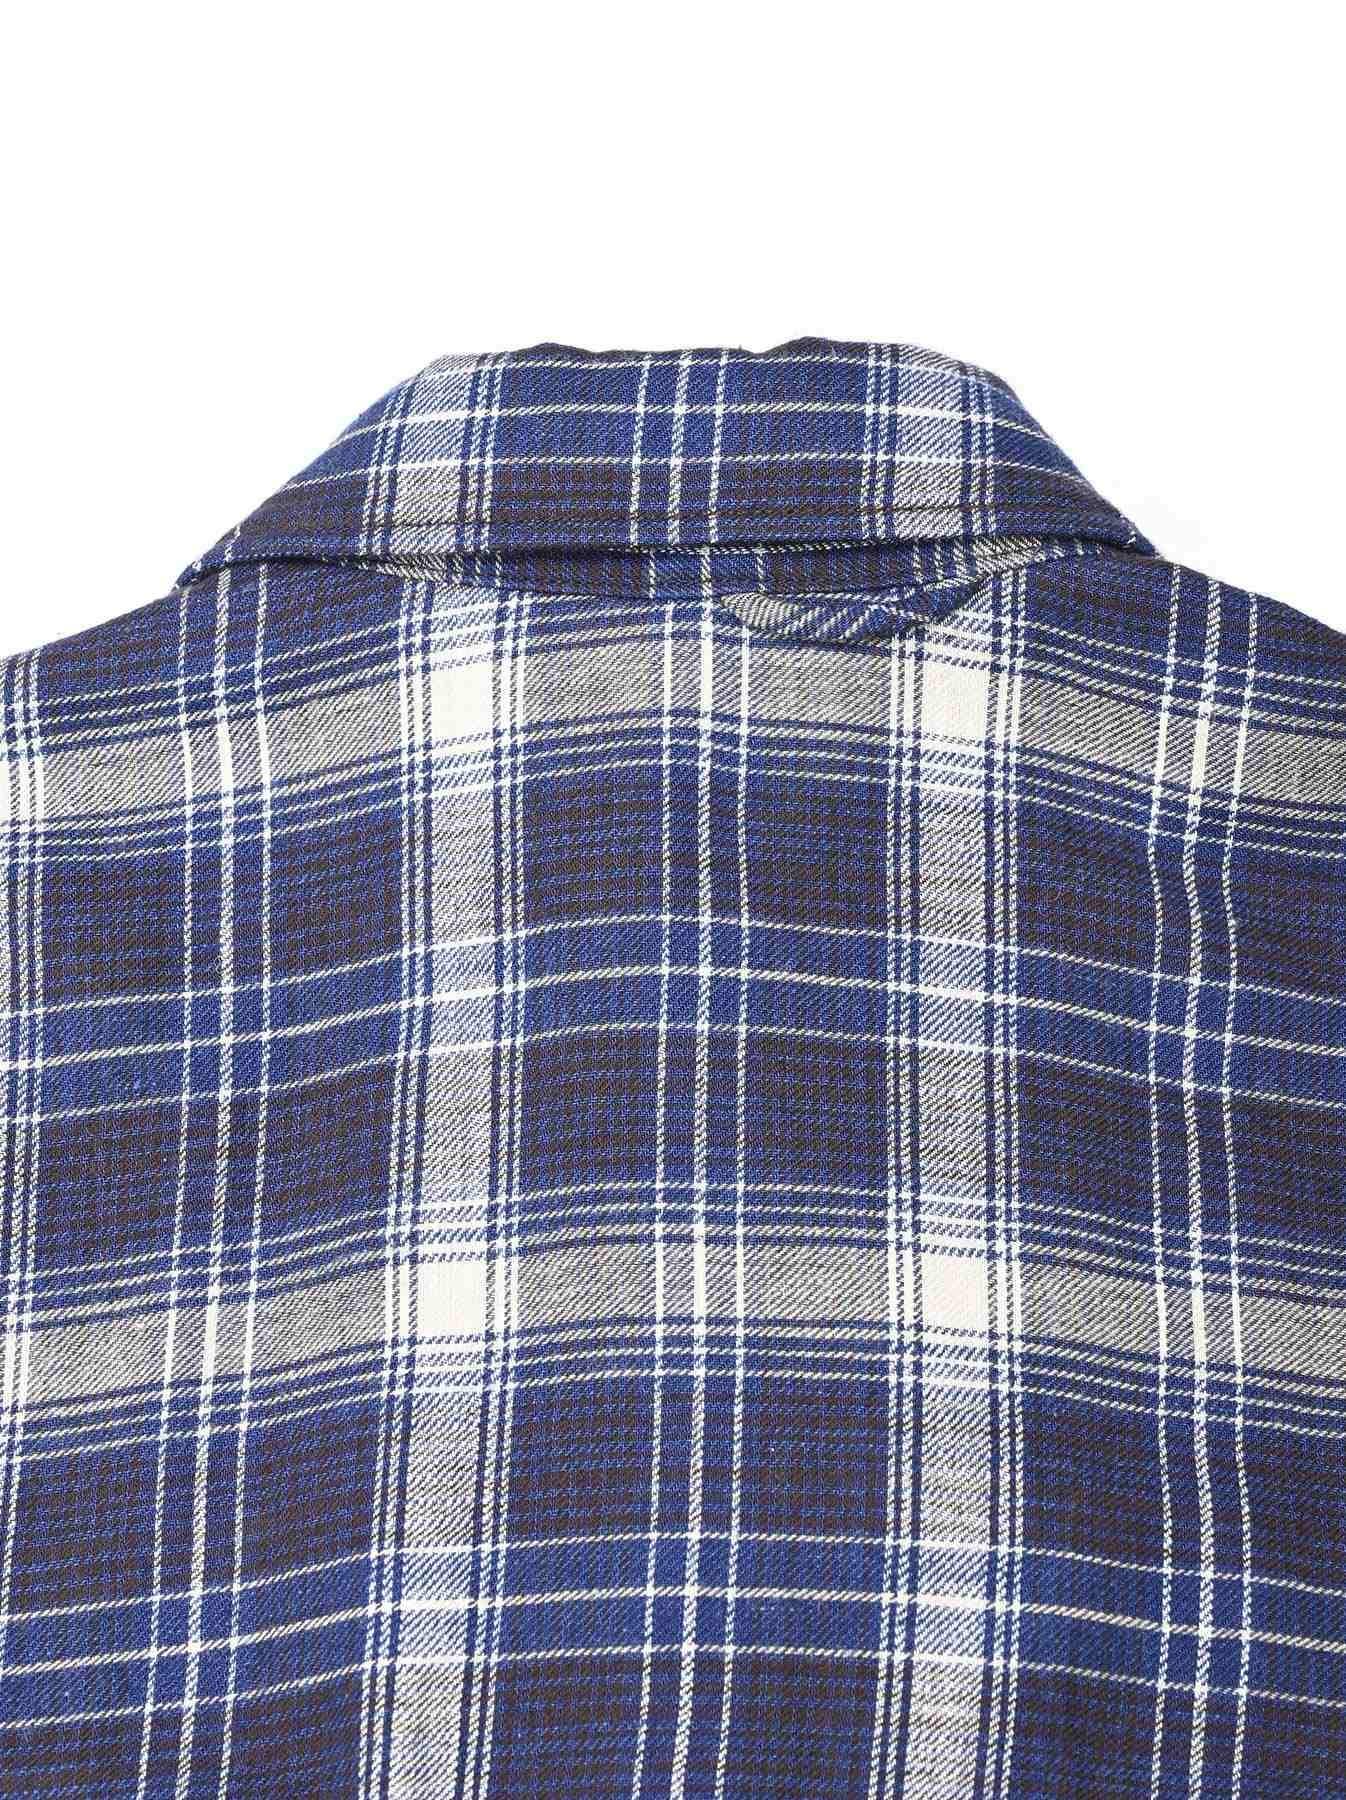 Indigo Twill Double Cloth Shirt Dress-8